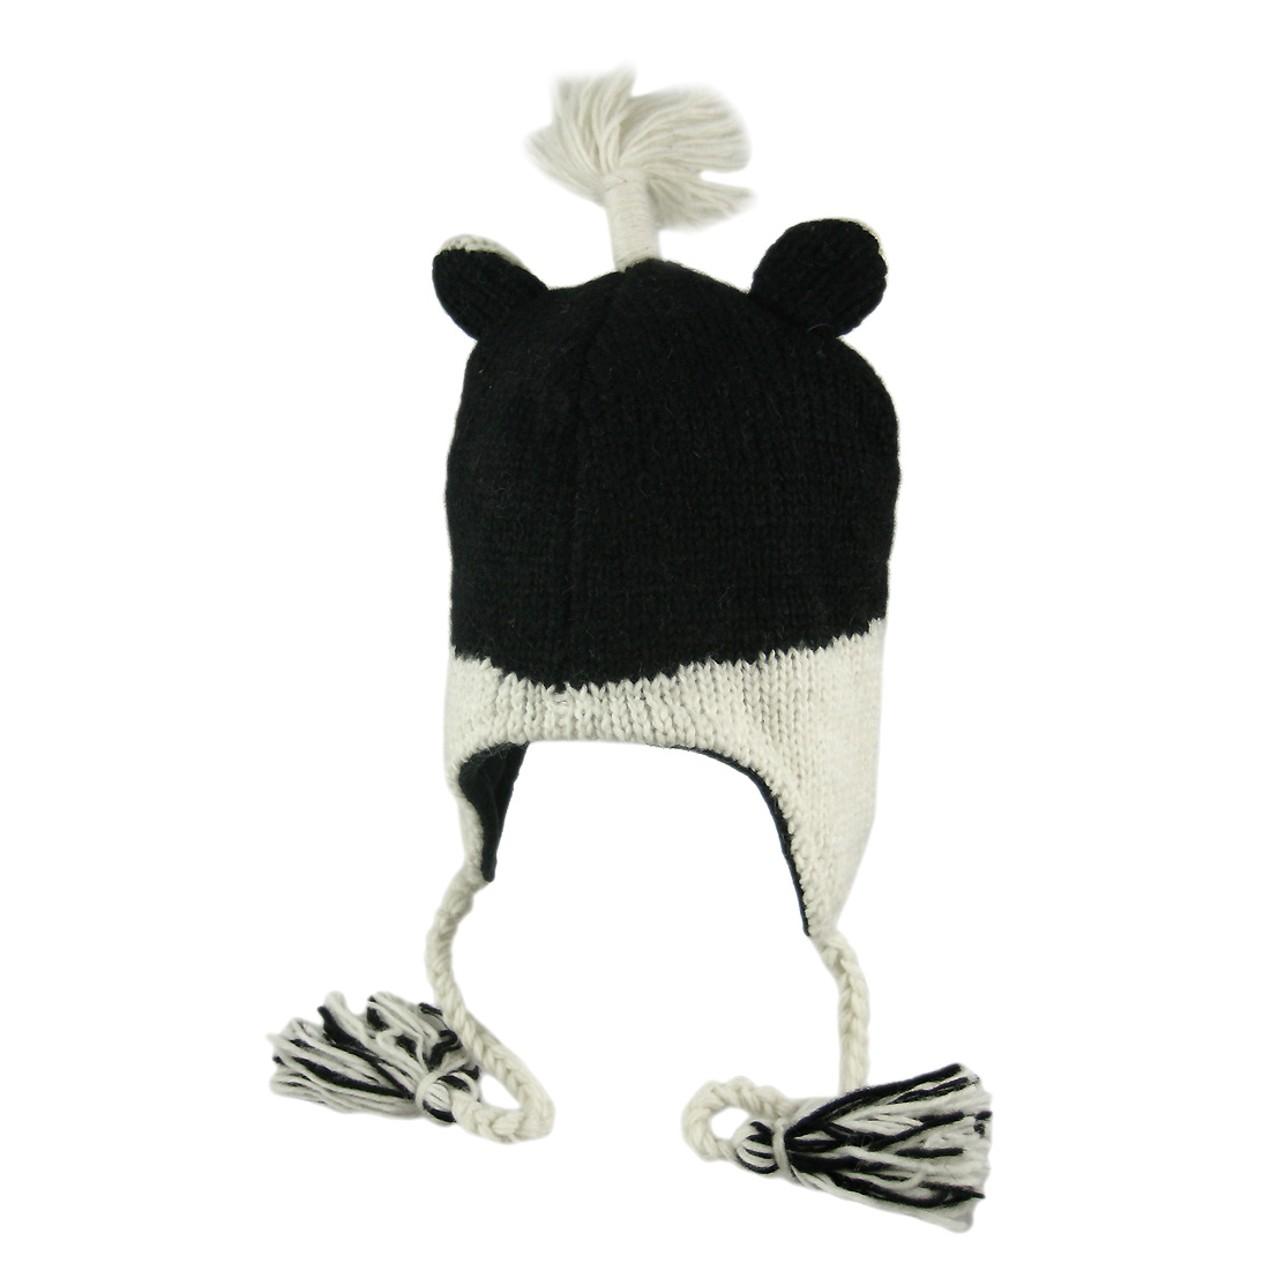 7d27c21f7 Wool Skunk Face Pilot Cap Winter Trooper Adult Mens Cold Weather ...